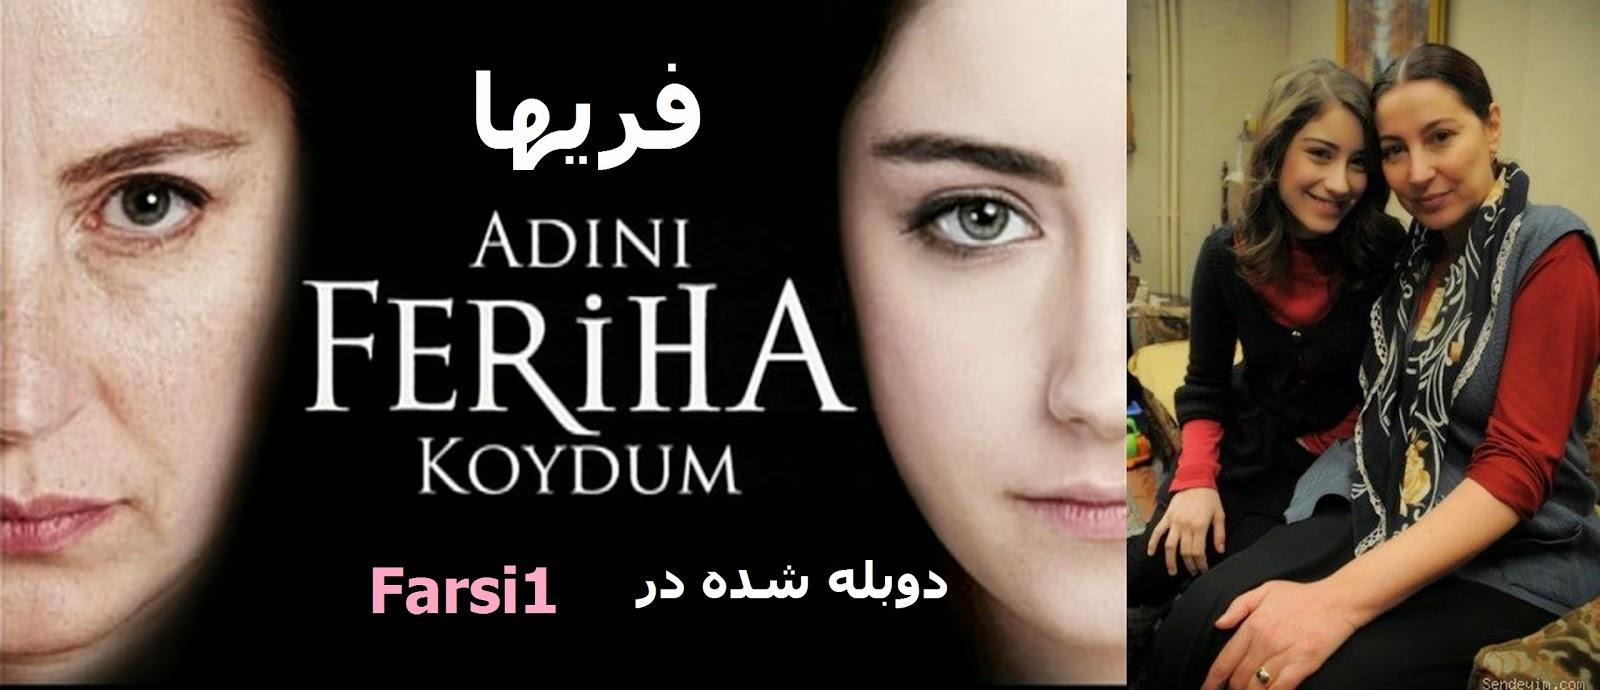 Feriha drama season 2 in english subtitles : Lab rats season 2